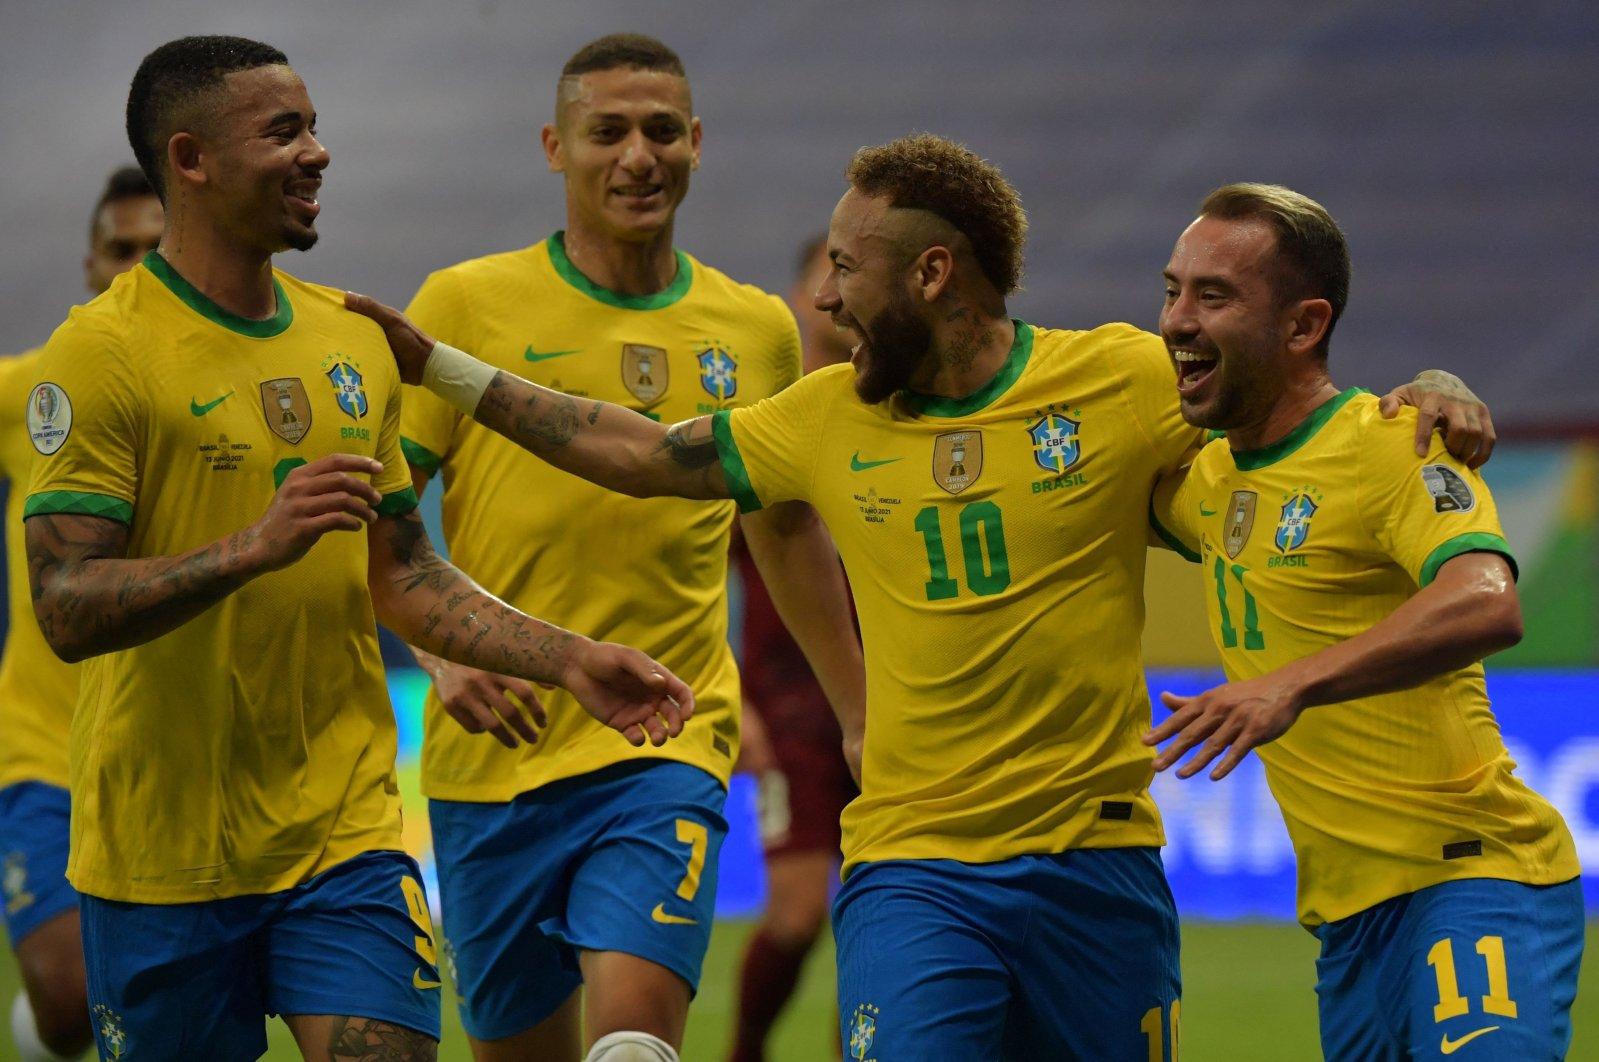 Brazil's Neymar (2nd R) celebrates with teammates after scoring against Venezuela during the CONMEBOL Copa America 2021 football tournament group phase match at the Mane Garrincha Stadium, Brasilia, Brazil, June 13, 2021. (AFP Photo)